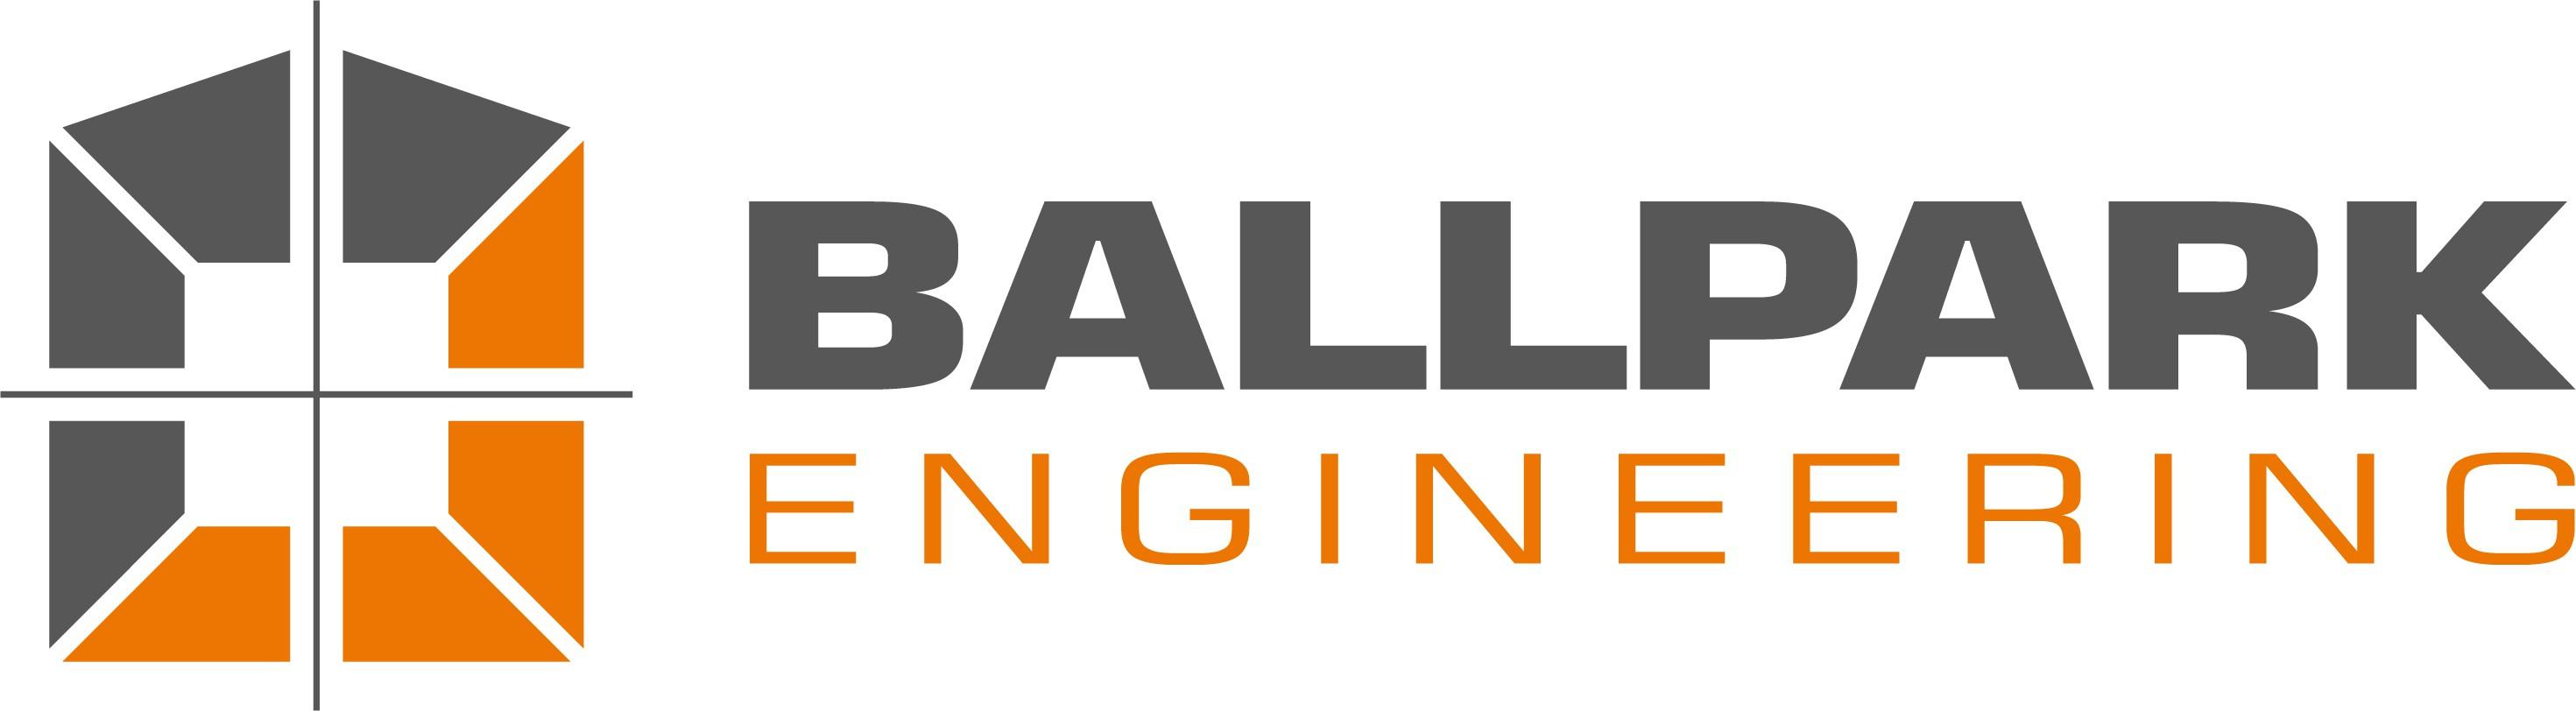 ENGINEERING LOGO - simple, modern, unique, masculine, professional